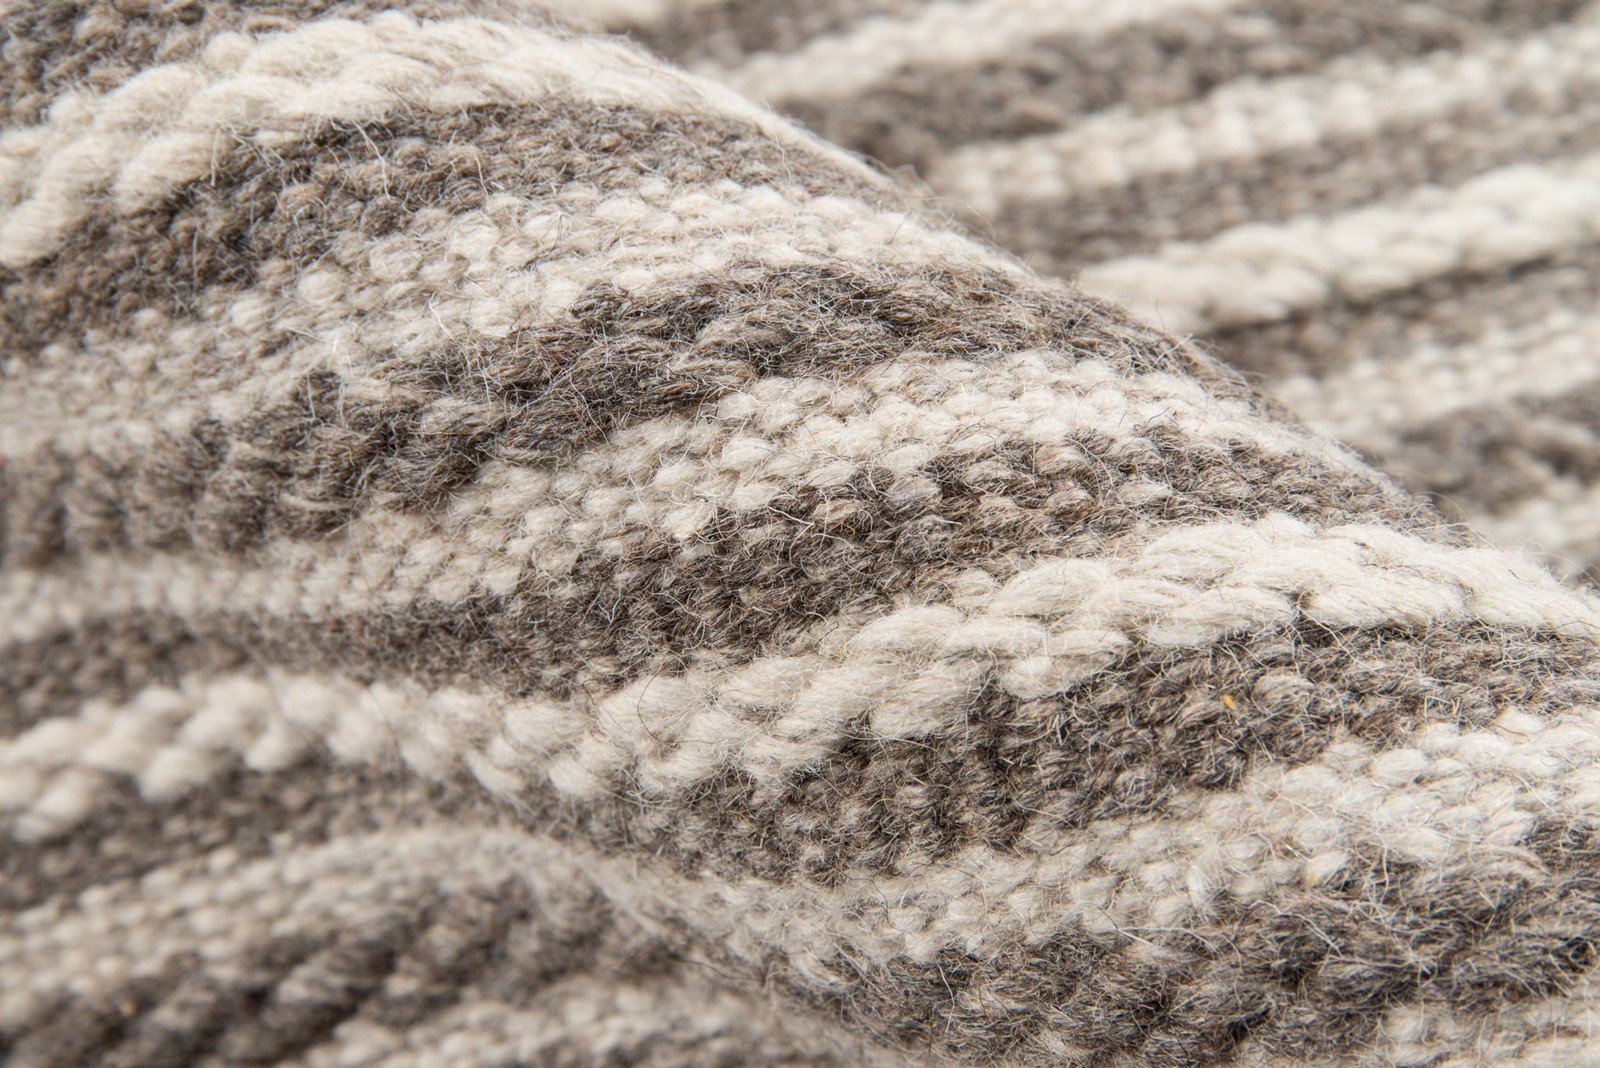 Momeni Rugs MESA0MES-3NAT5080 Mesa Collection, 100% Wool Hand Woven Flatweave Transitional Area Rug, 5' x 8', Natural Brown by Momeni Rugs (Image #4)